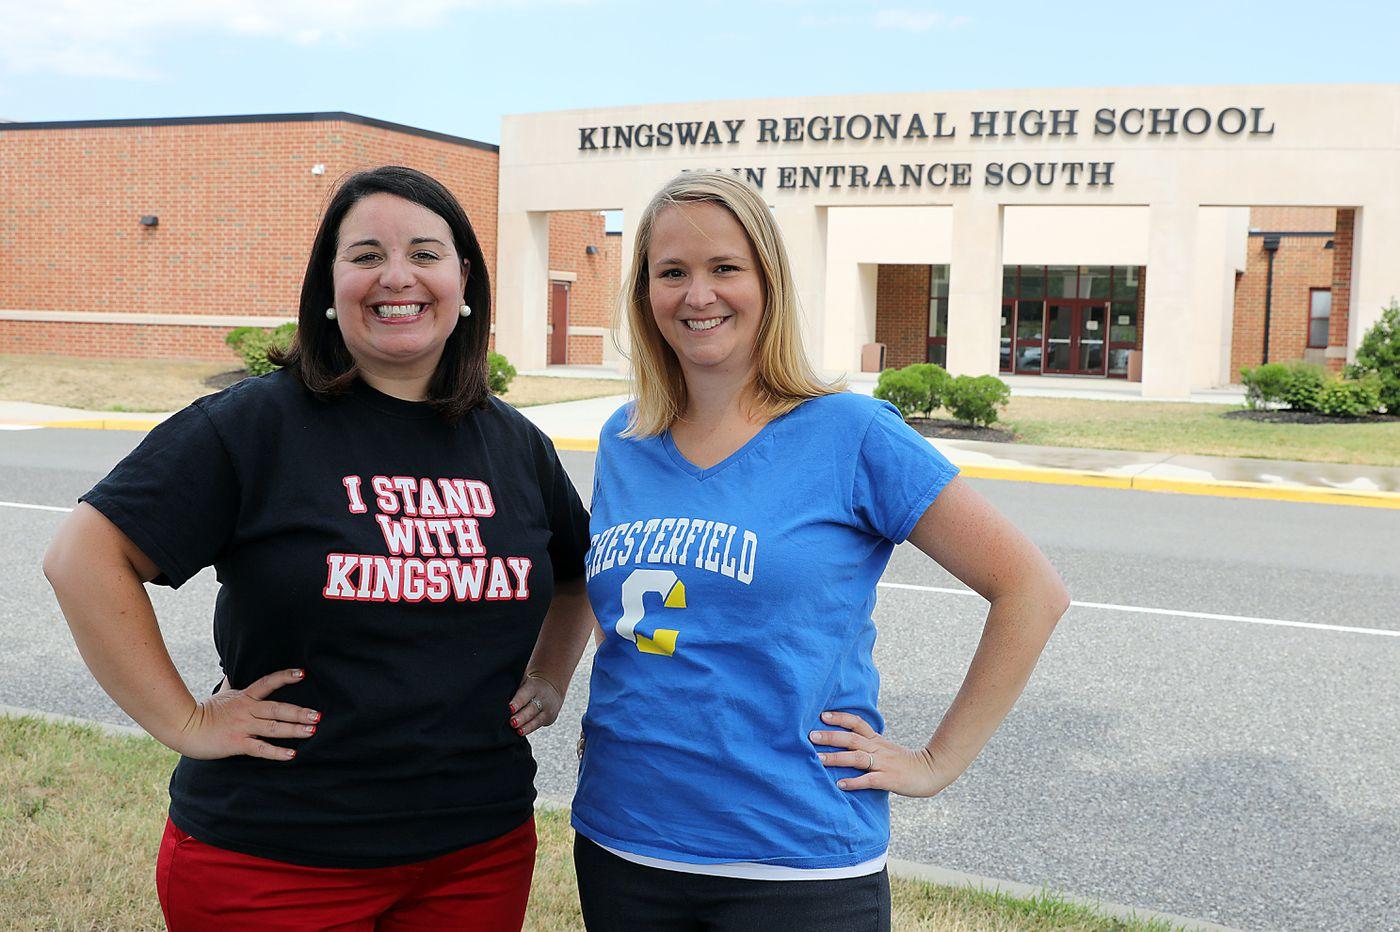 Andrea Suwa n.j. adding $351 million to schools, and 'moms' help make it